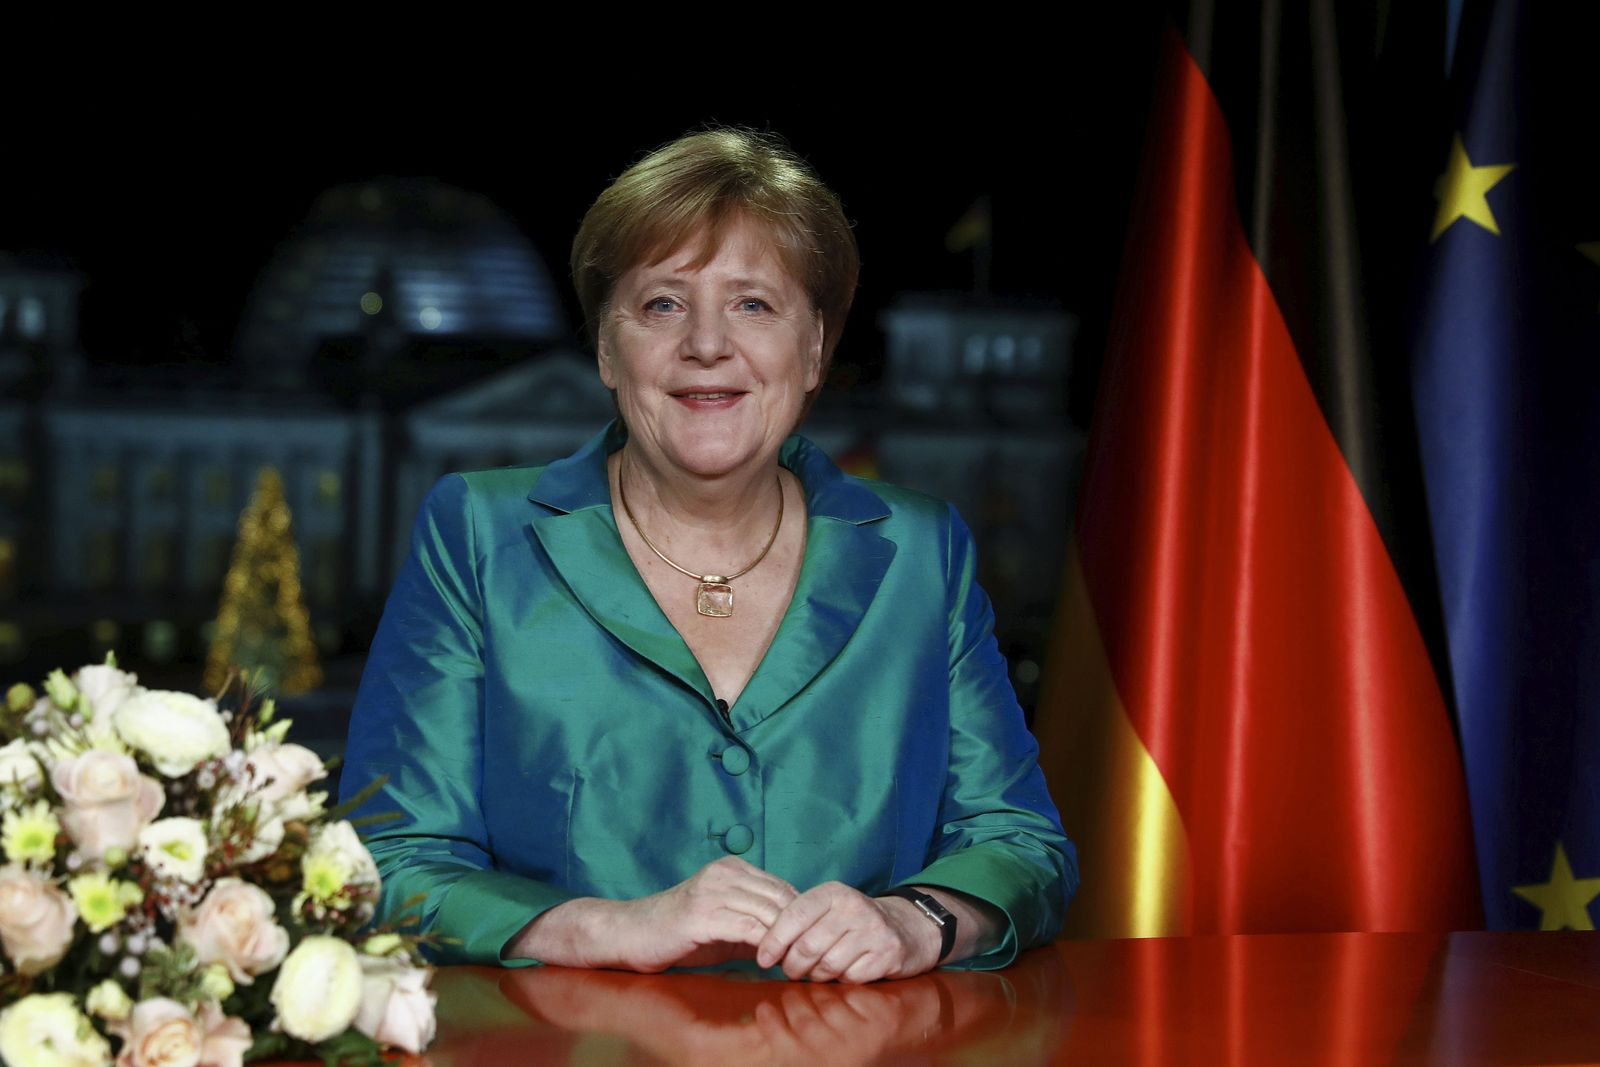 Germany Merkel New Year